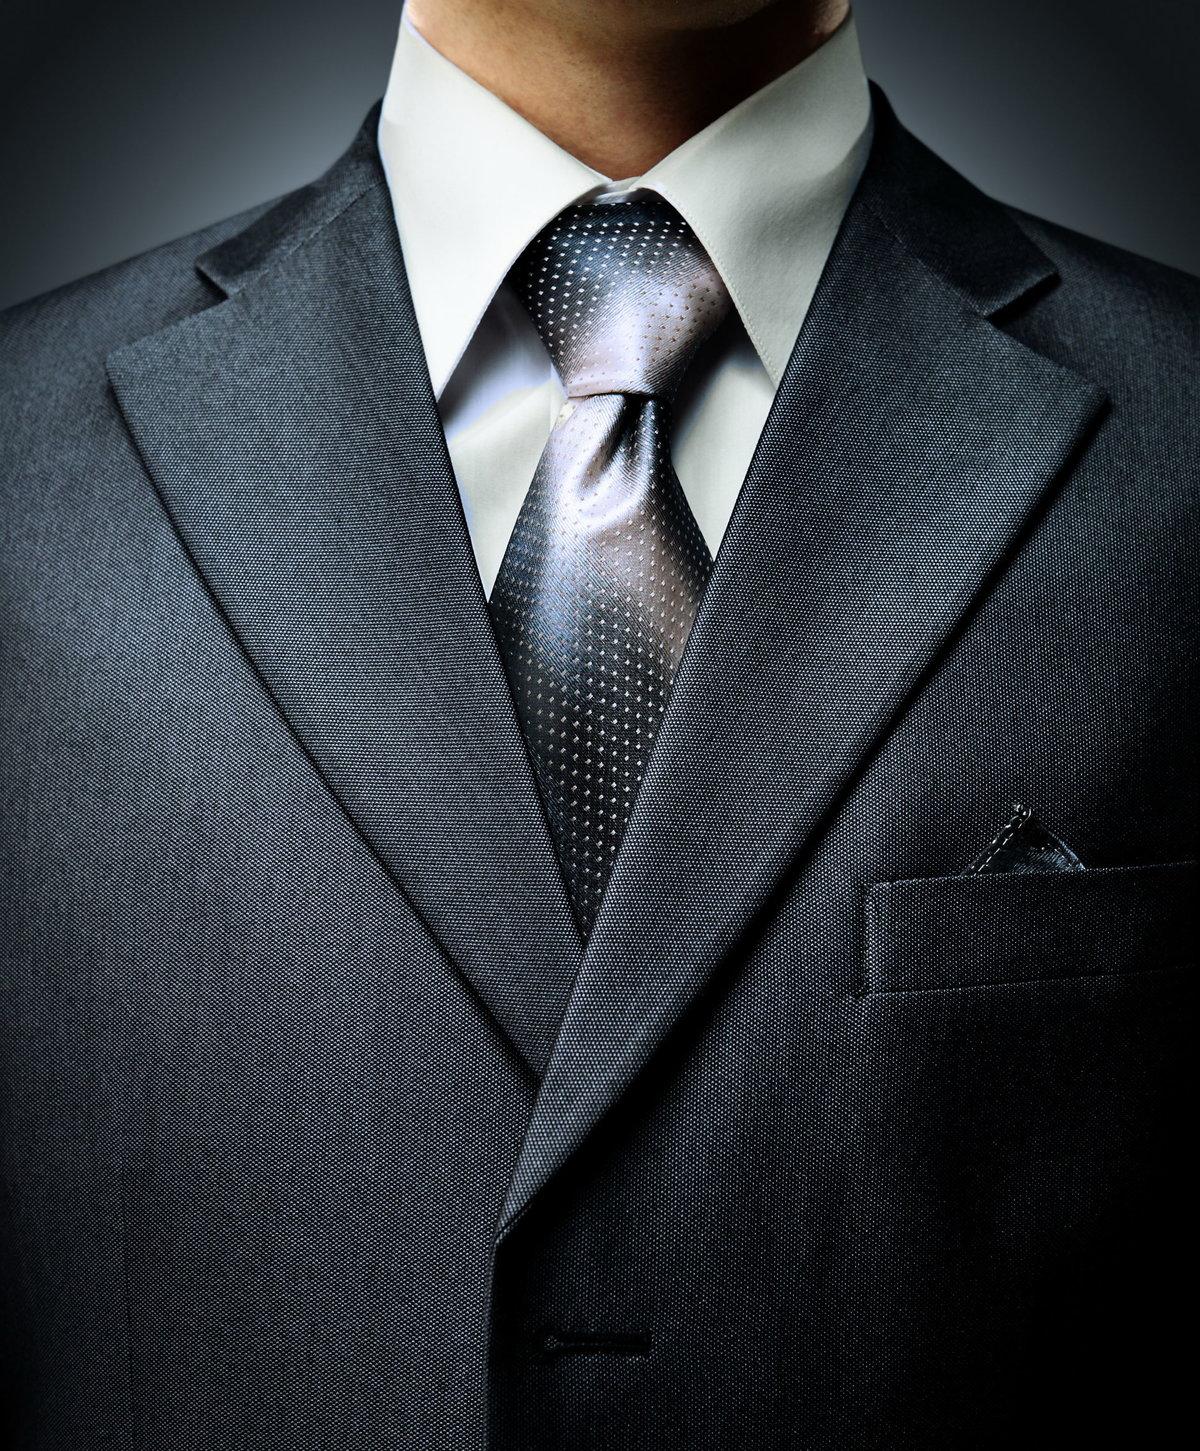 Картинки, картинка пиджак с галстуком